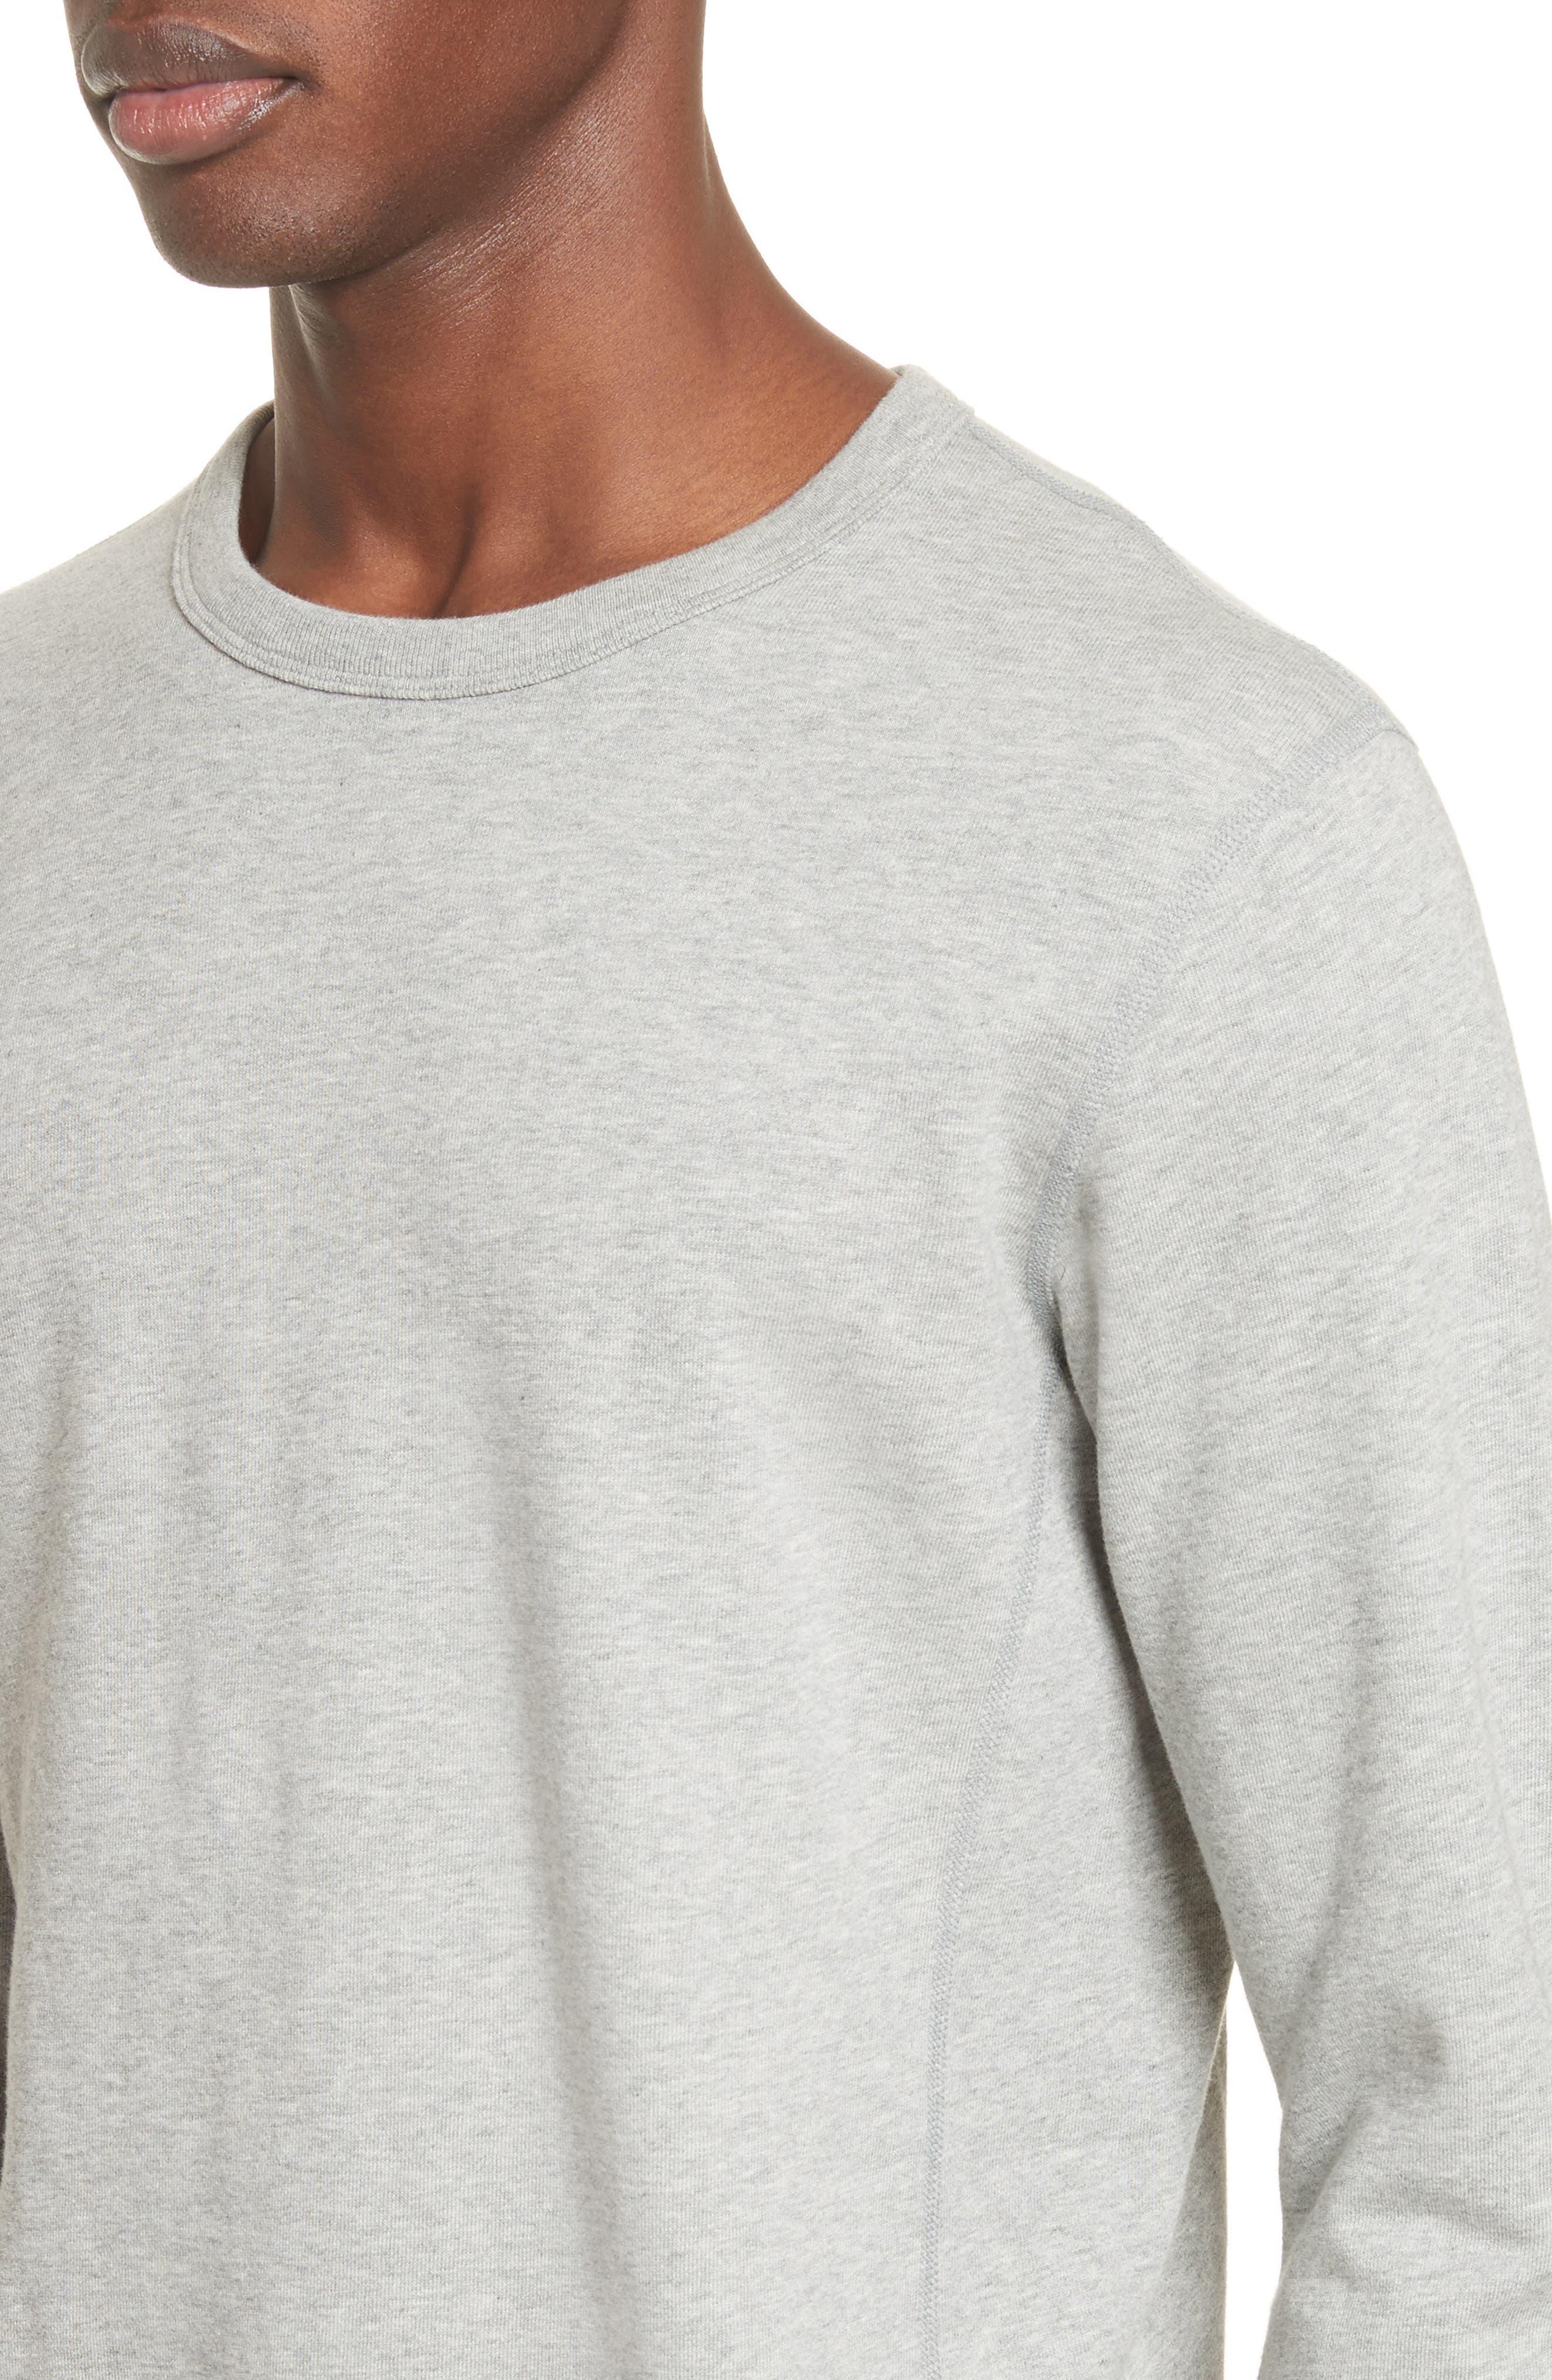 Crewneck Sweatshirt,                             Alternate thumbnail 4, color,                             060